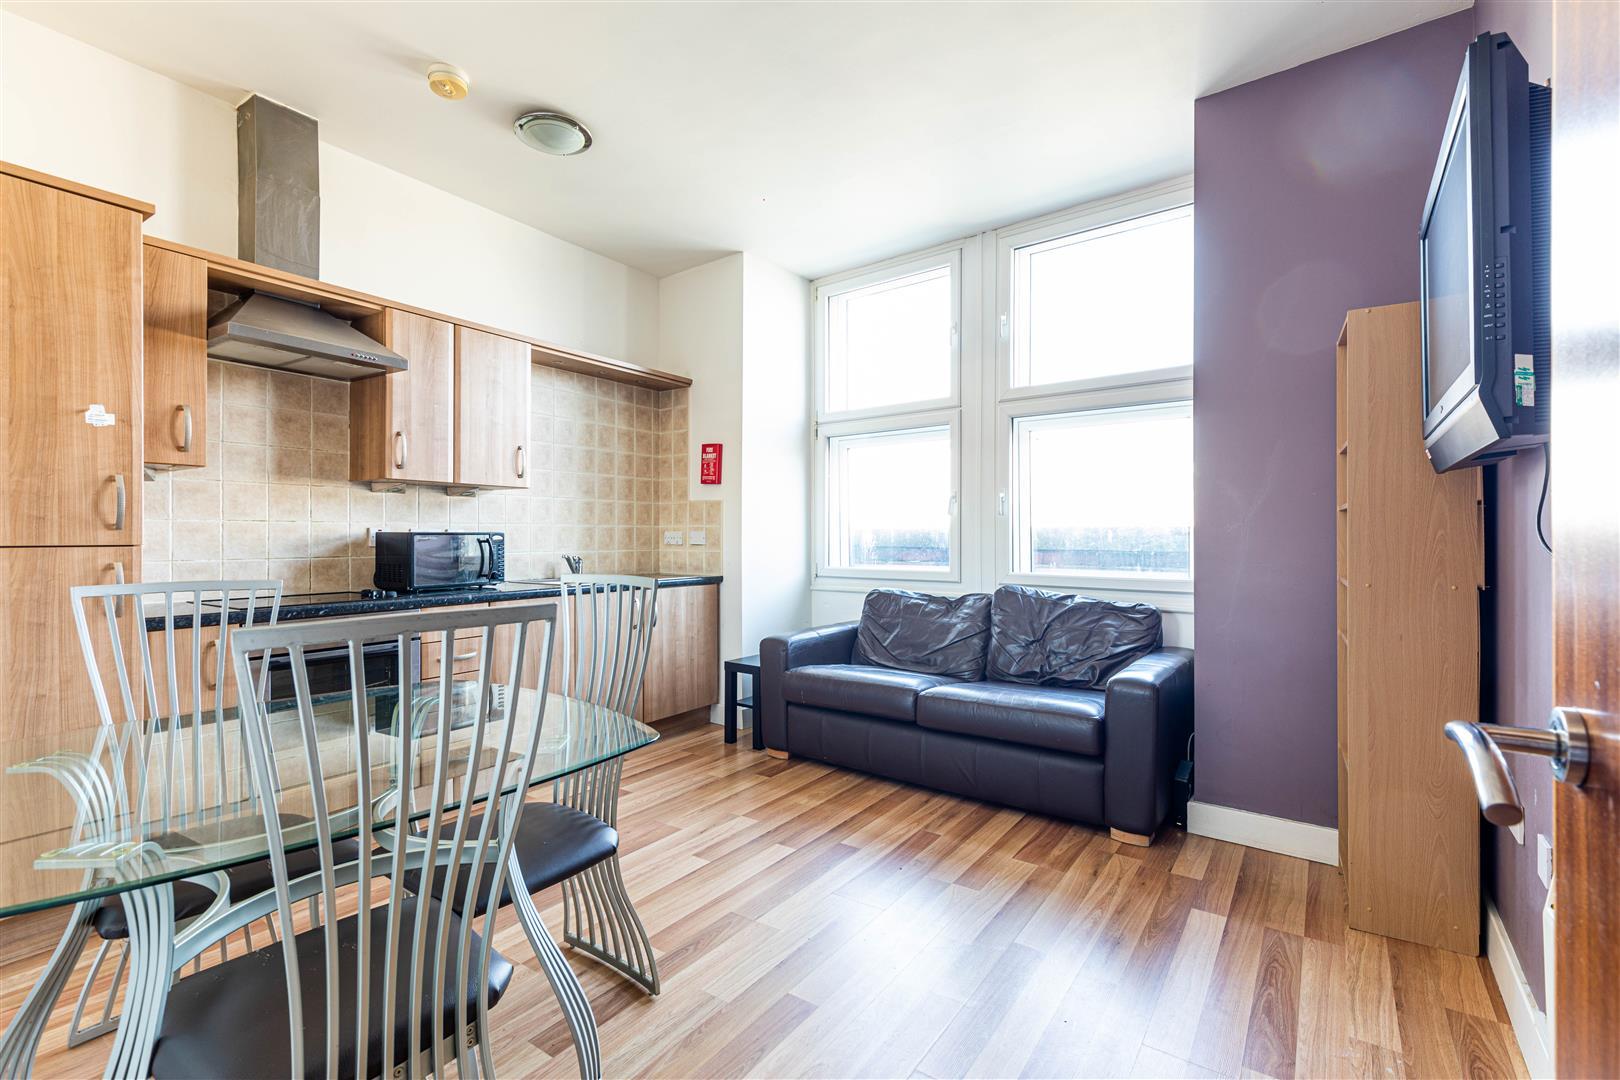 2 bed apartment to rent in Newcastle Upon Tyne, NE1 7DE, NE1